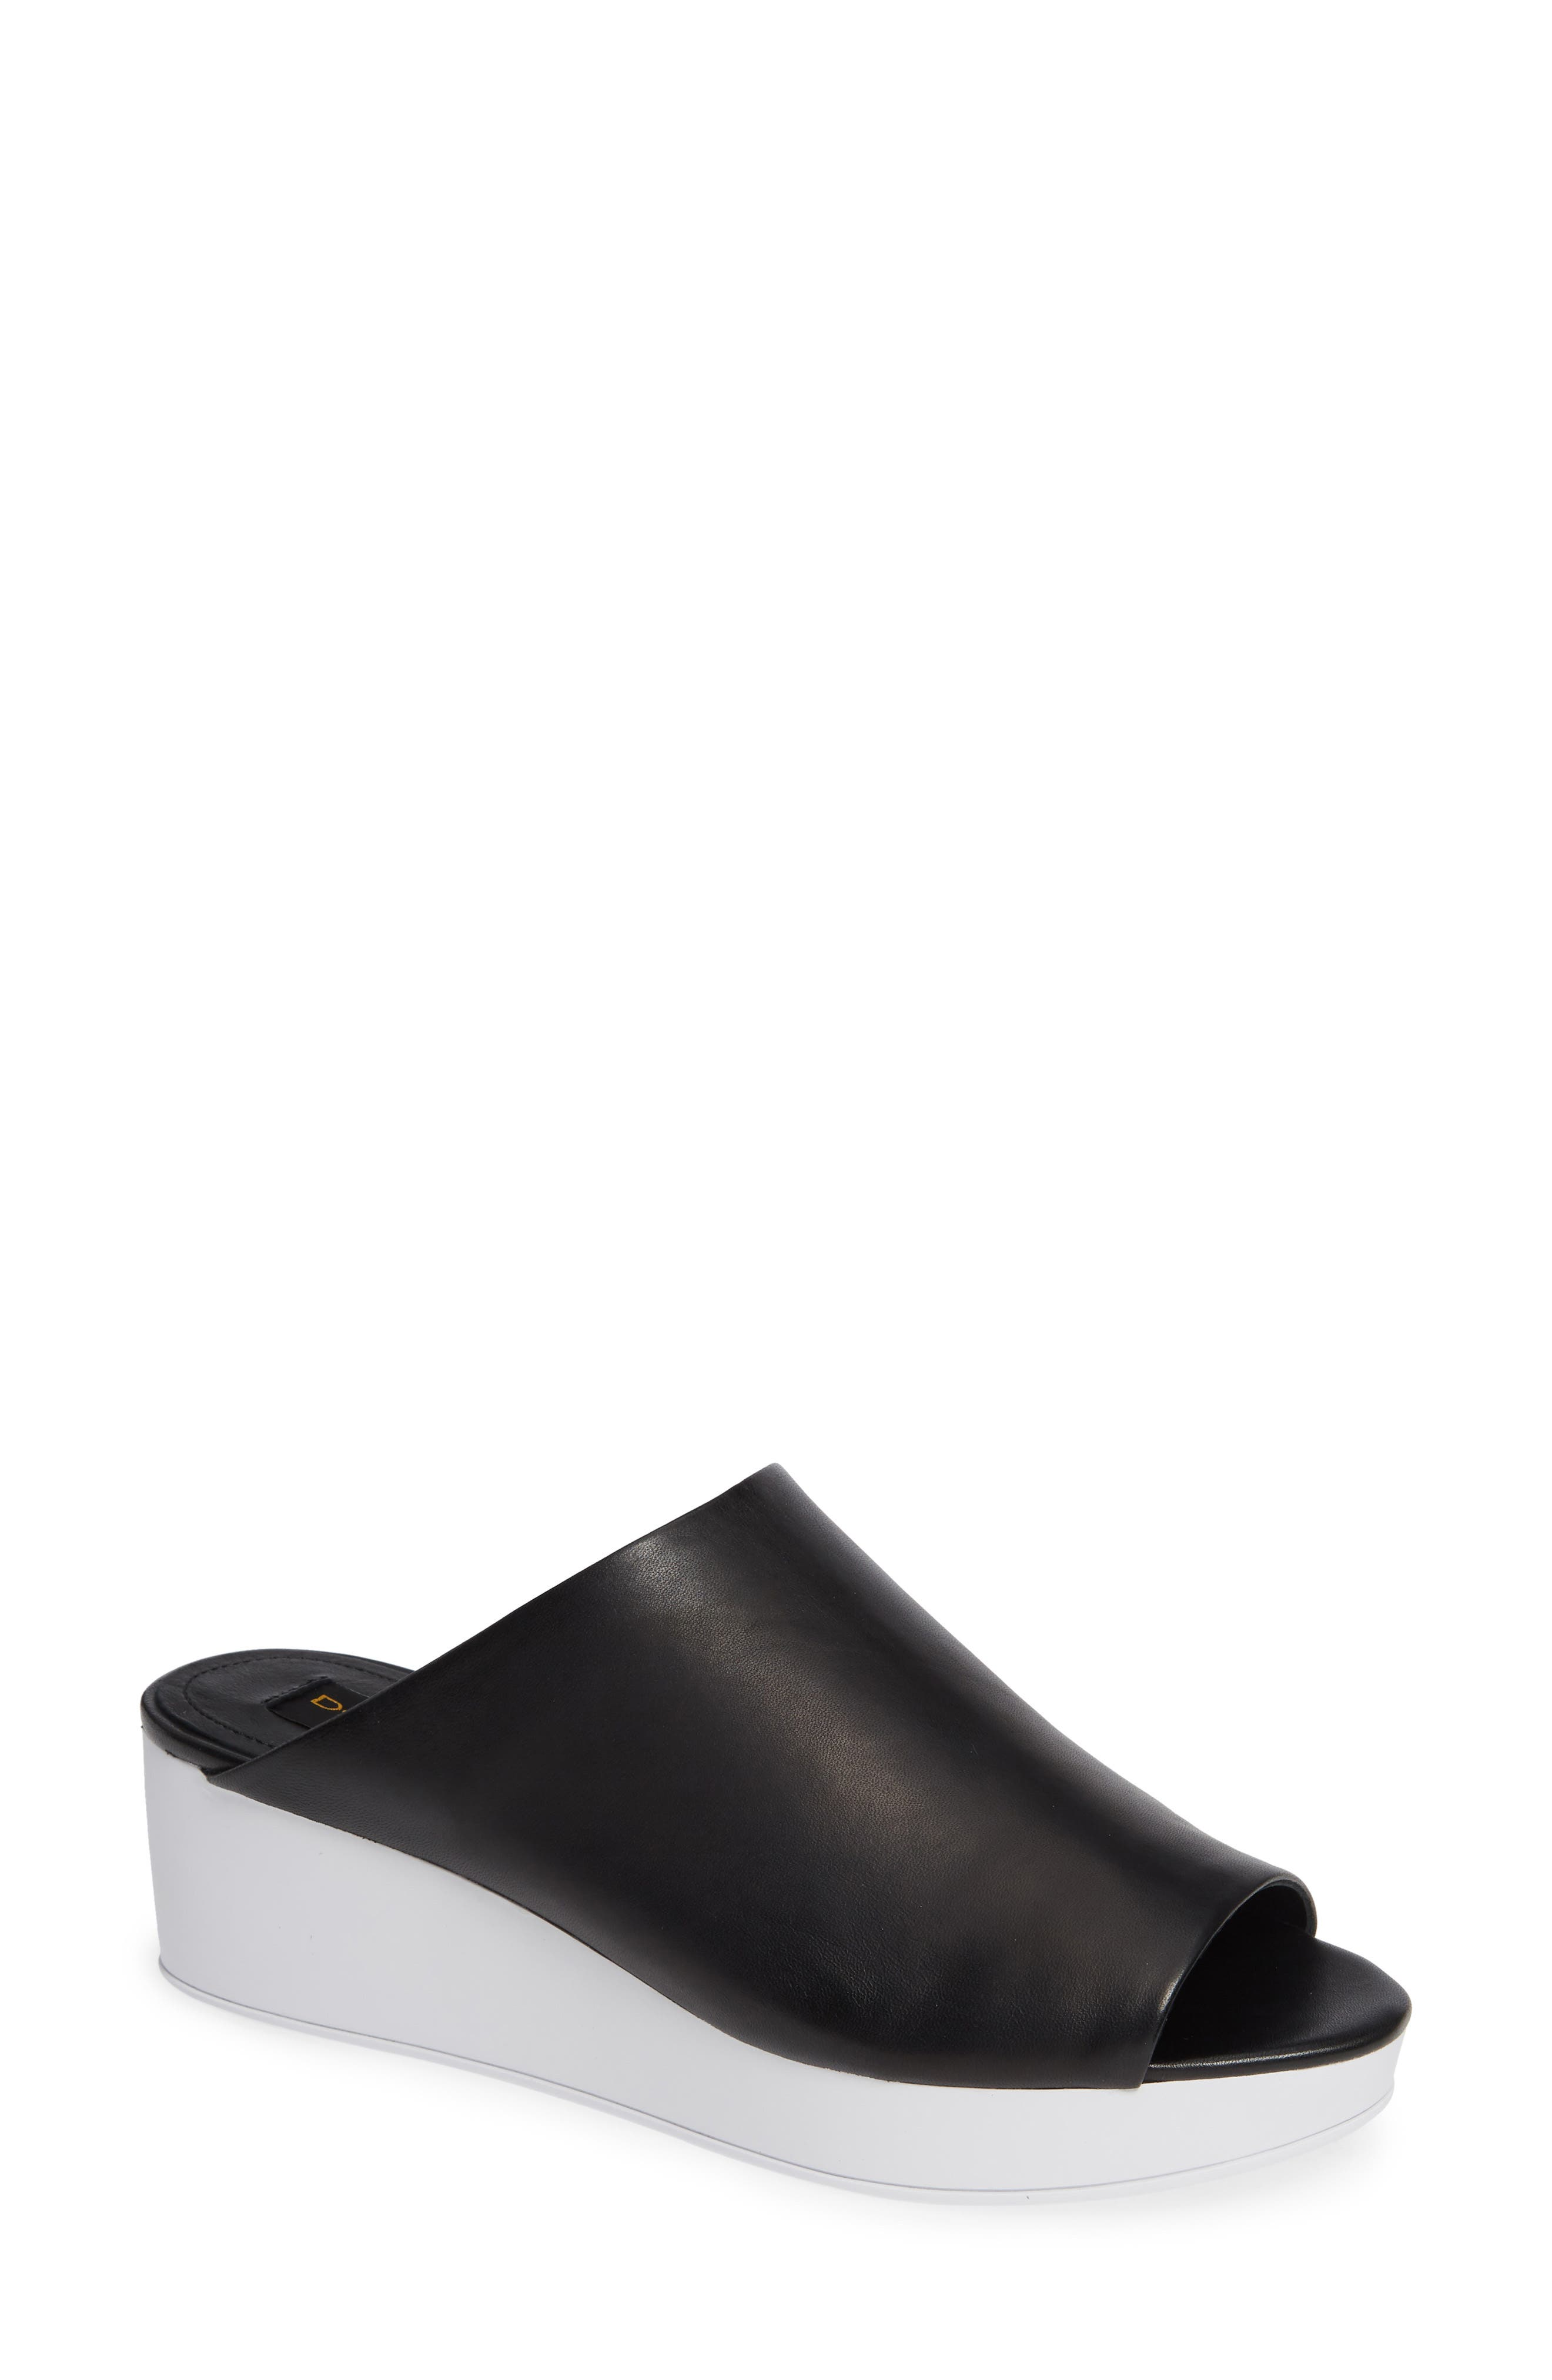 Donna Karan Reisley Wedge Slide Sandal, Black